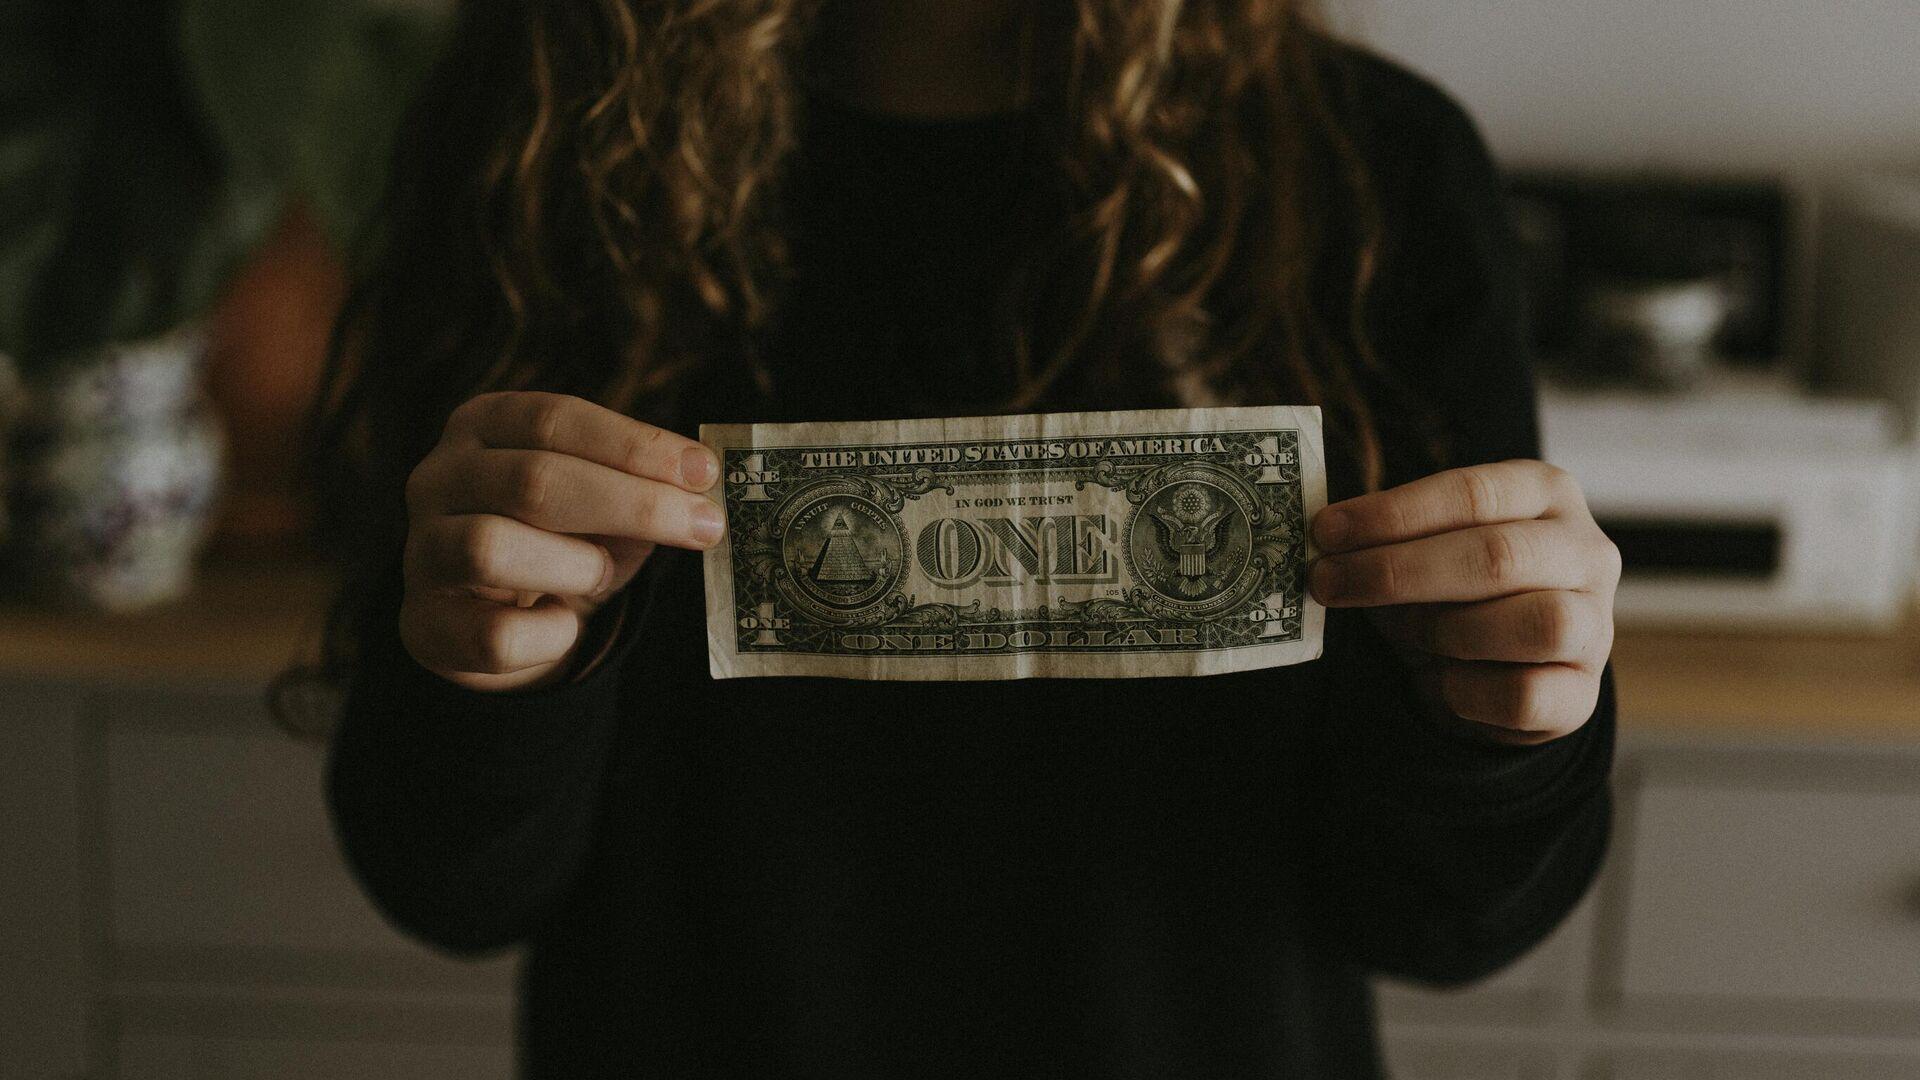 Una mujer sostiene un billete de un dólar () - Sputnik Mundo, 1920, 18.07.2021